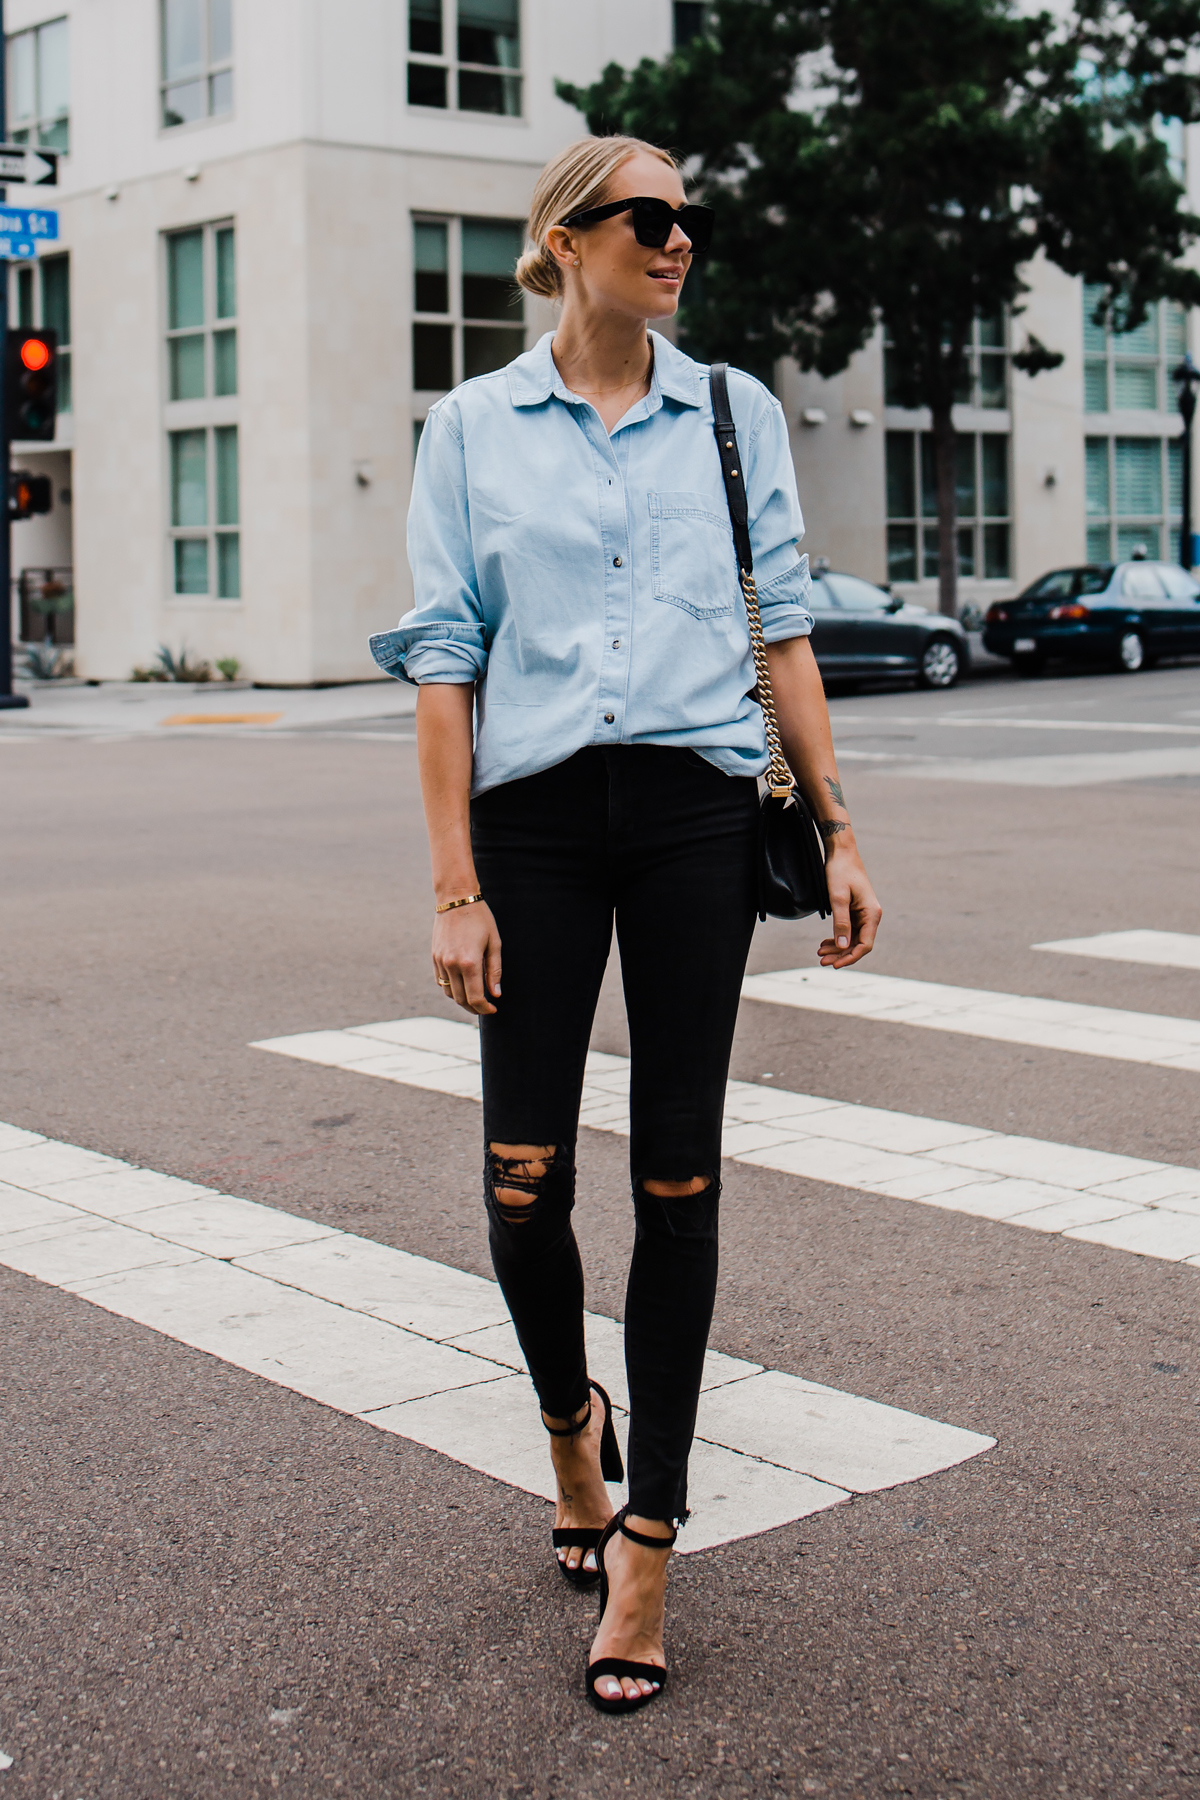 2839da9a Blonde Woman Wearing Topshop Oversized Denim Shirt Topshop Black Ripped  Skinny Jeans Steve Madden Black Ankle